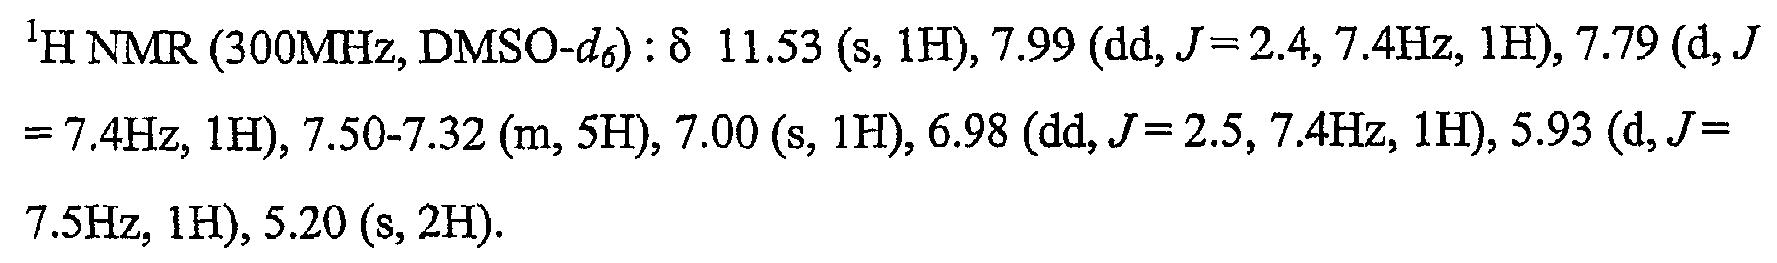 Figure 112006013759285-pct00103